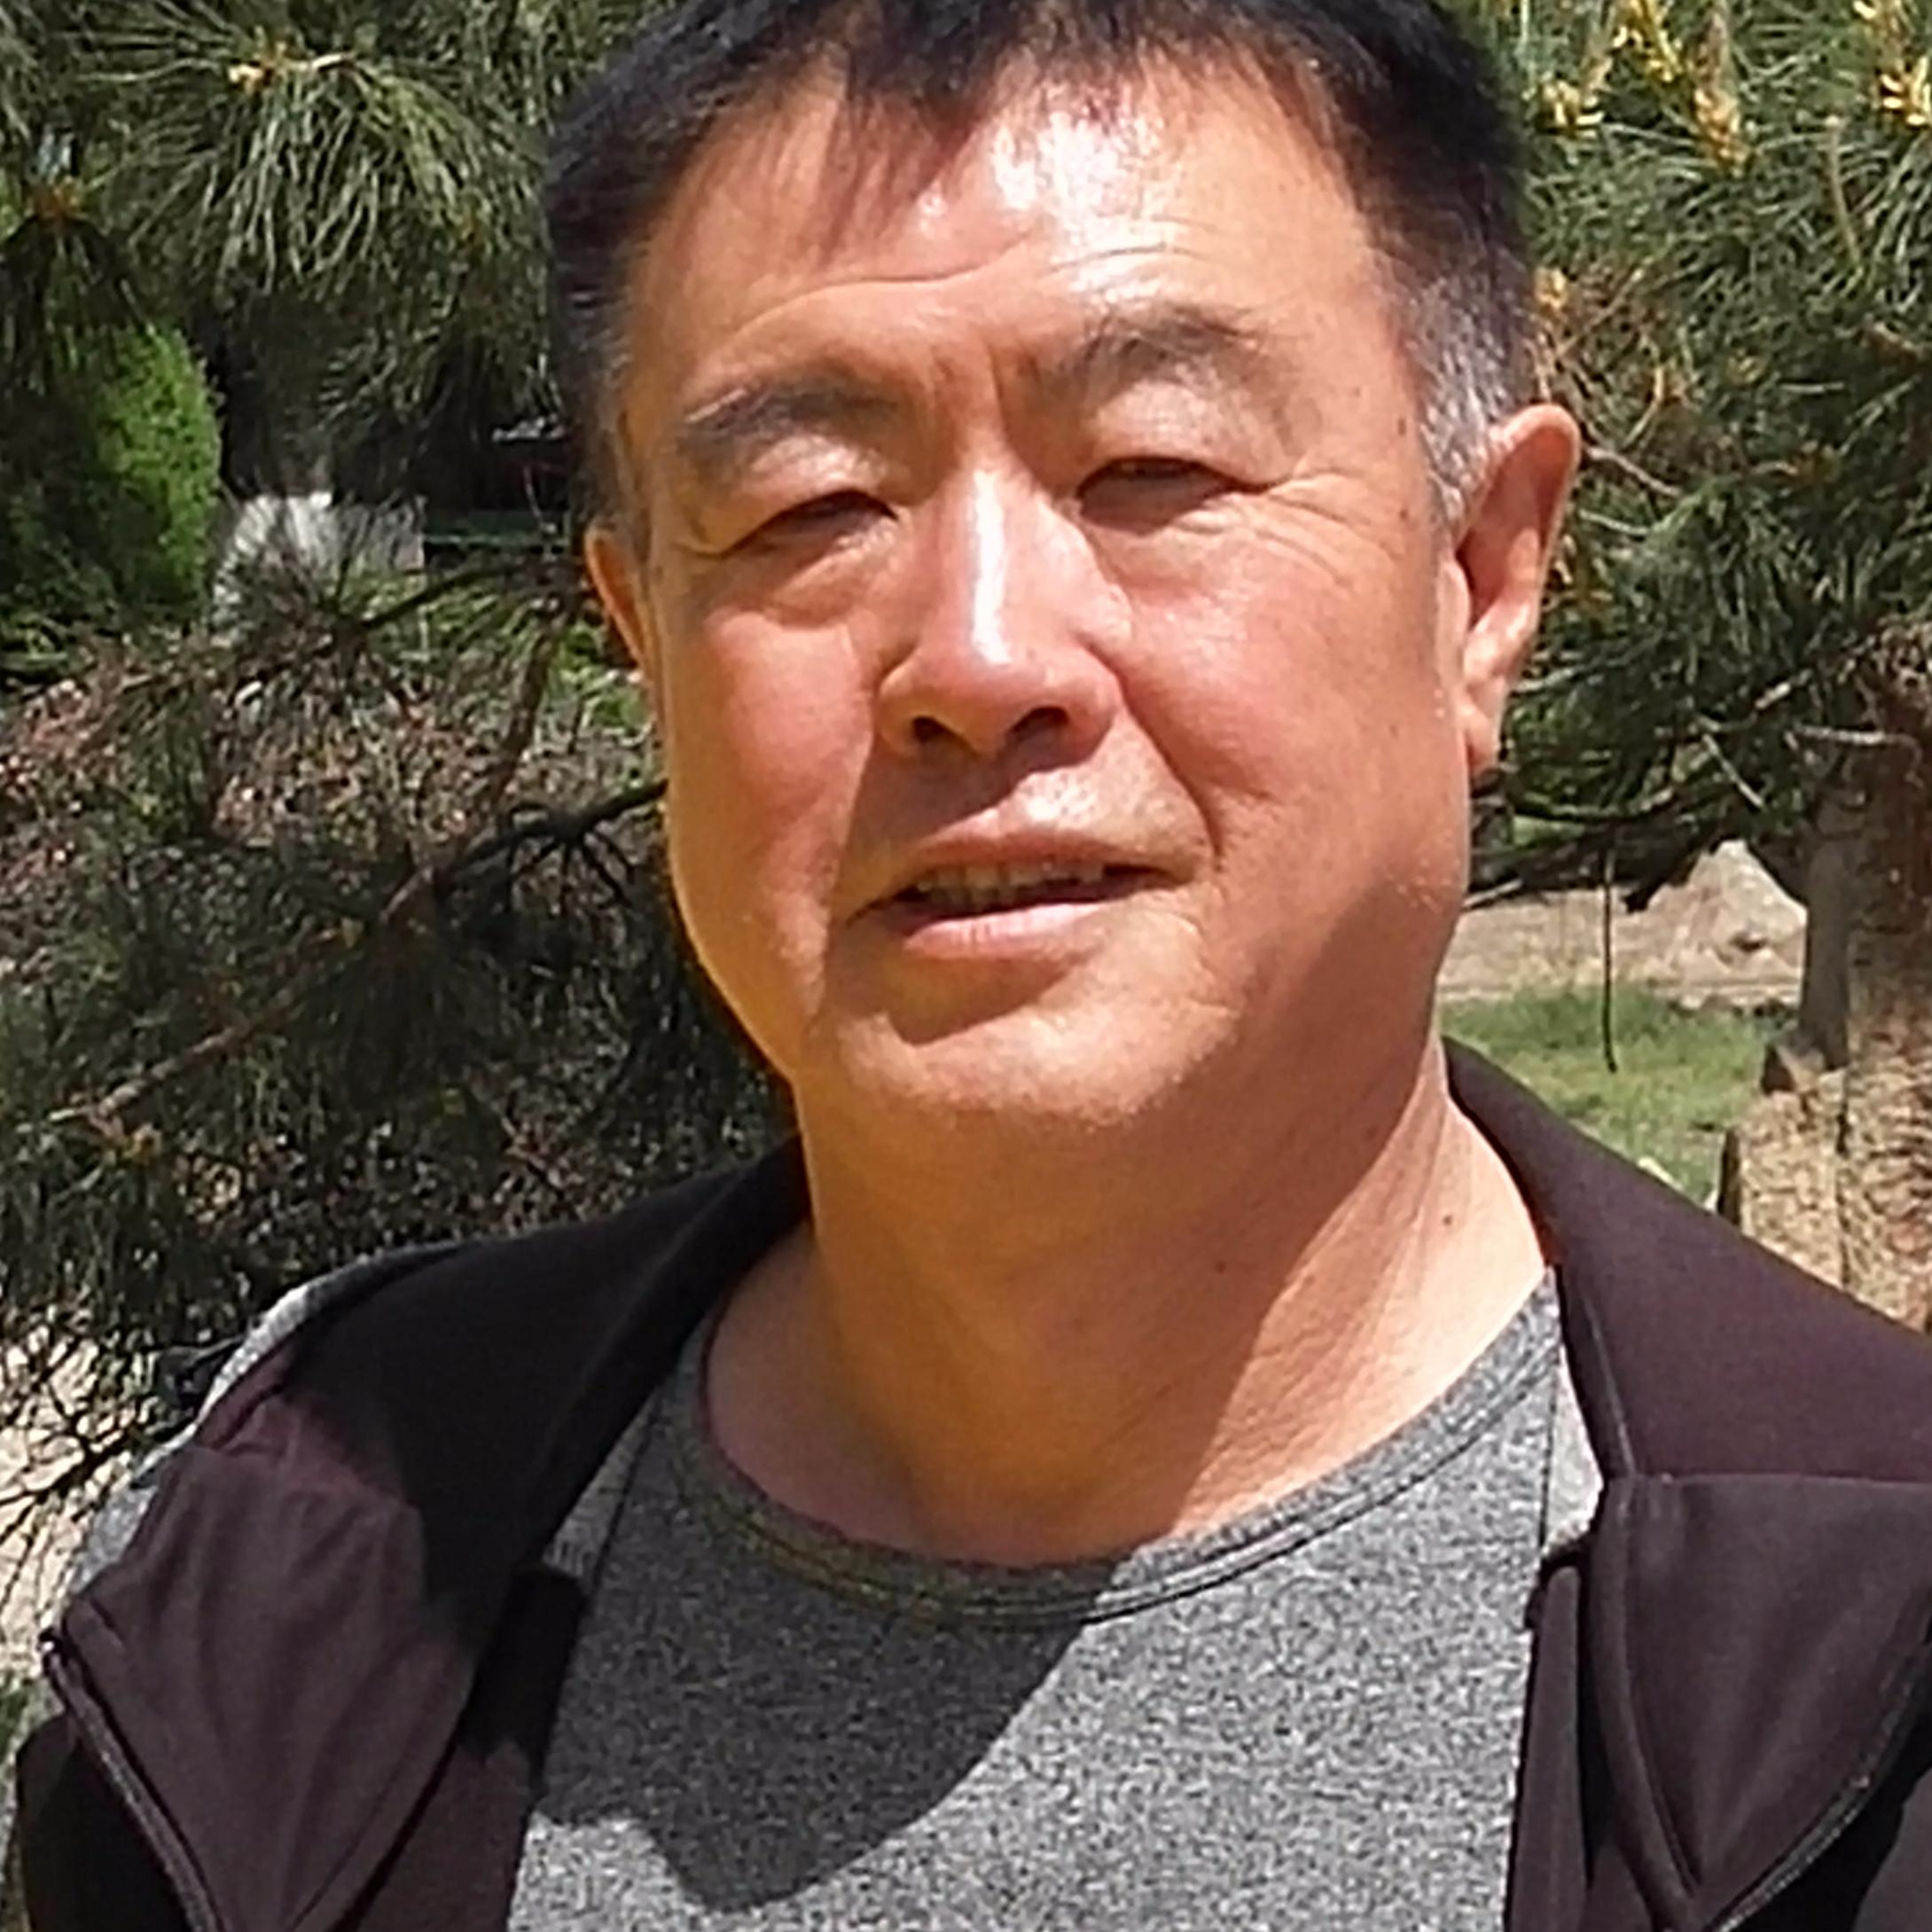 caoyuanage